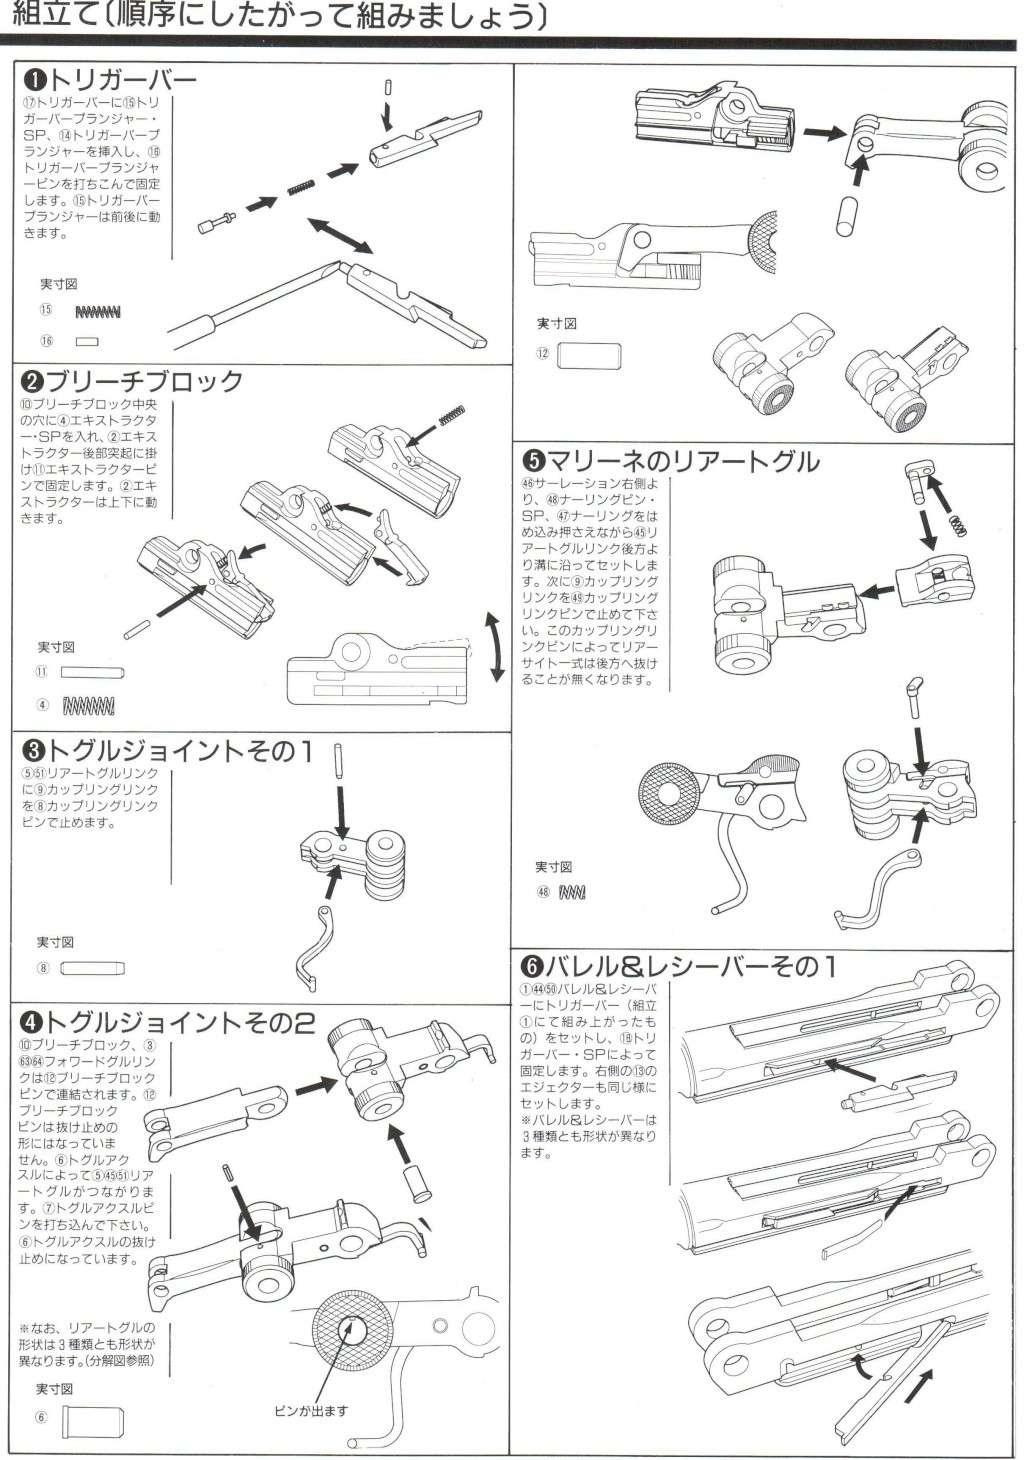 Marushin Metal KIT Dummy Cartridge Model LUGER P08 cal. 9 mm Instruction Manual C10